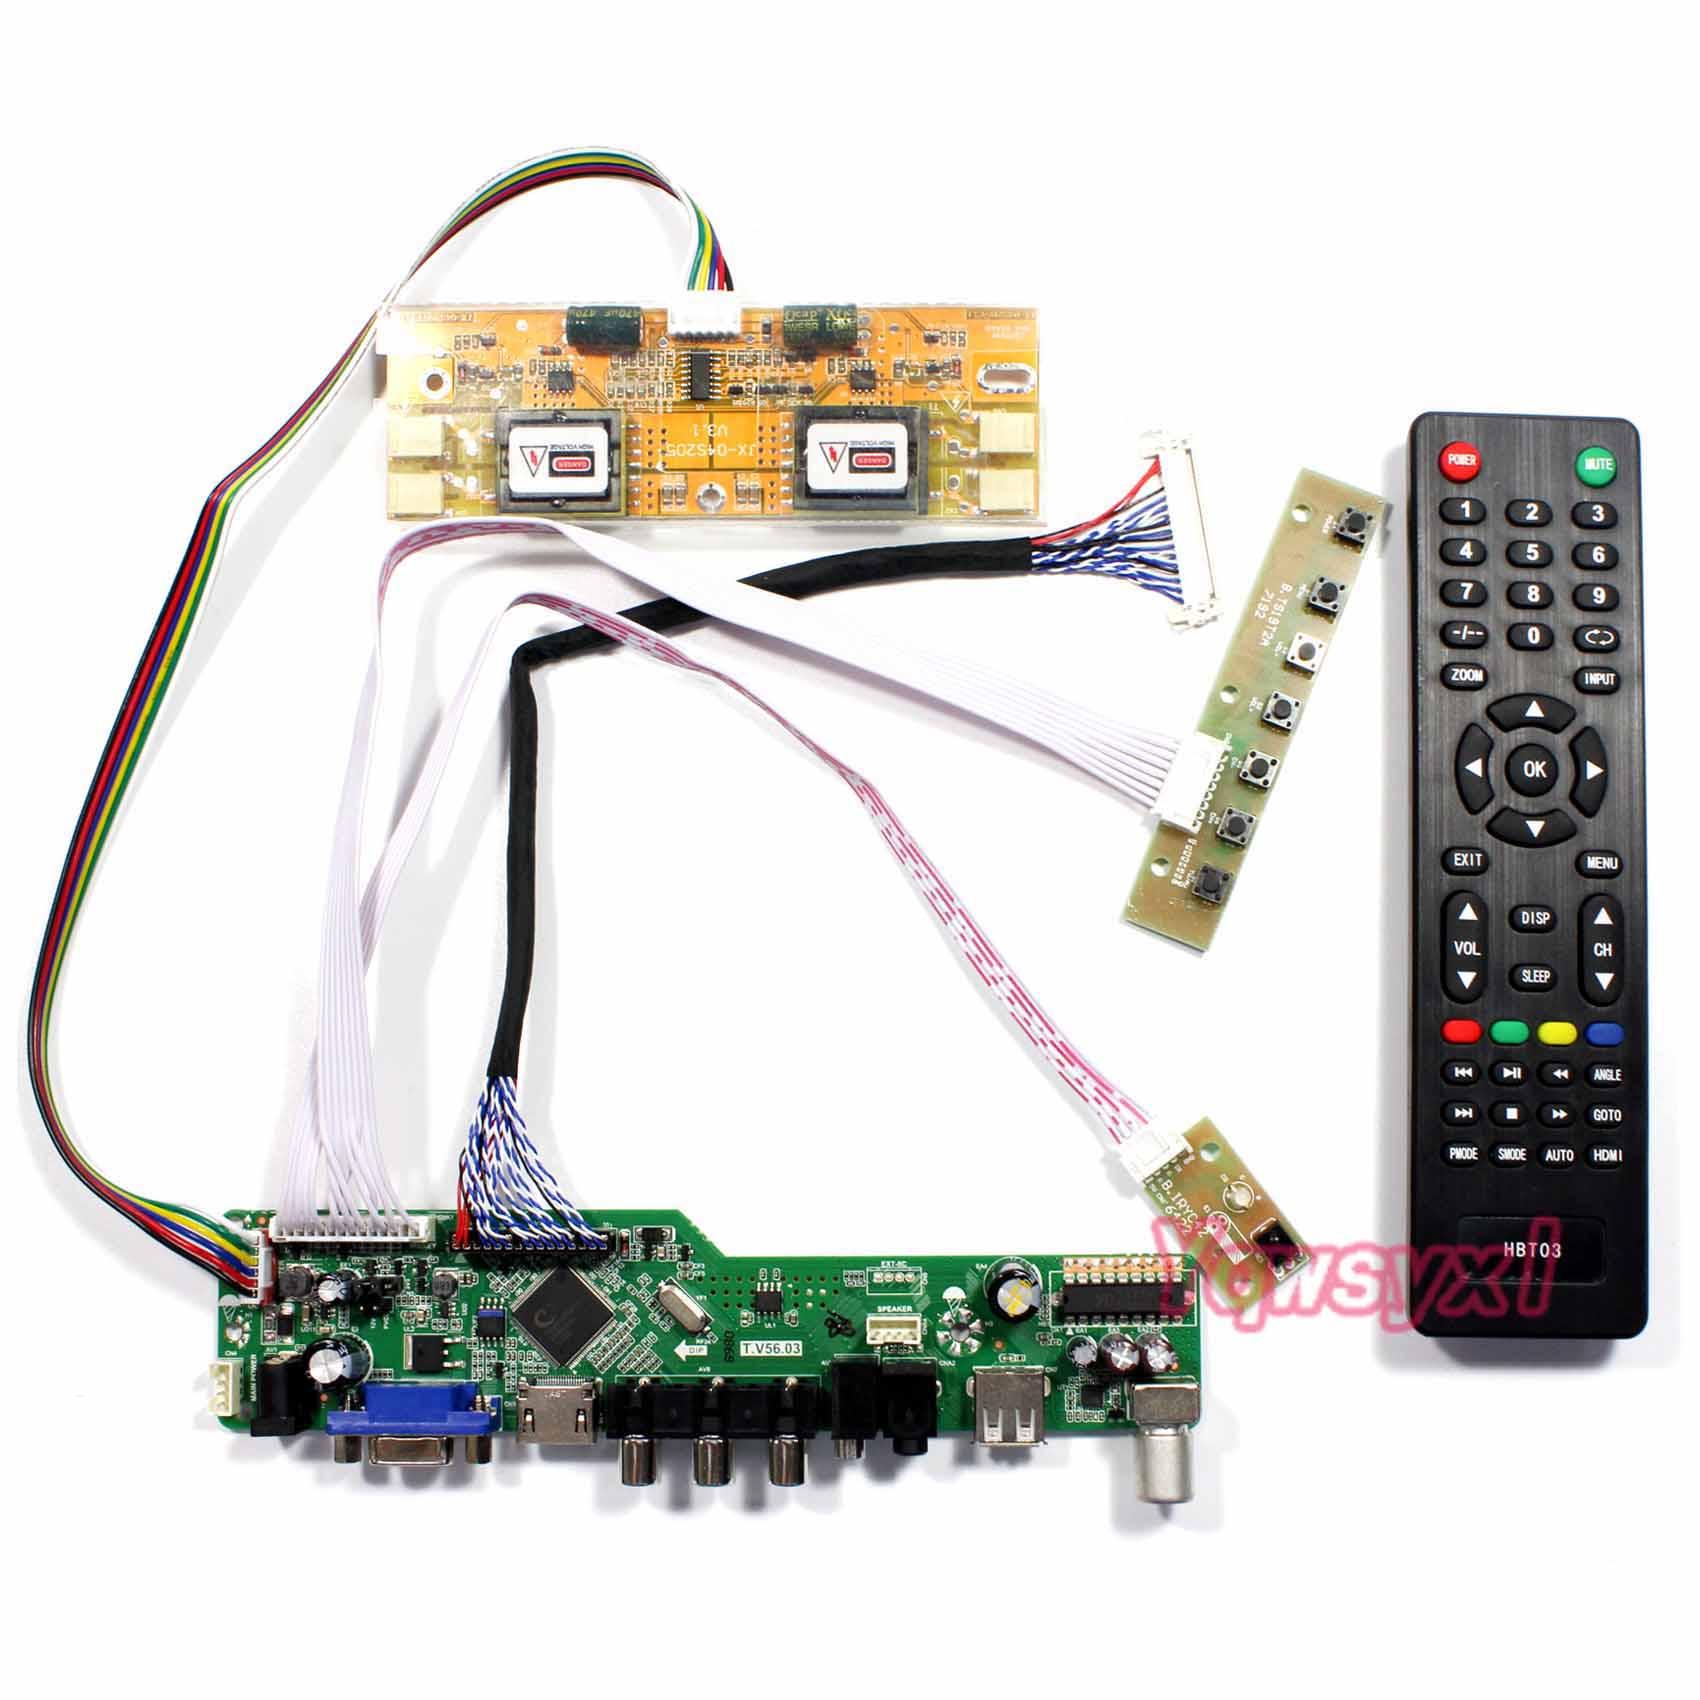 Yqwsyxl Kit For M220Z1-L03  M220Z1-L05  TV+HDMI+VGA+AV+USB LCD LED Screen Controller Driver Board